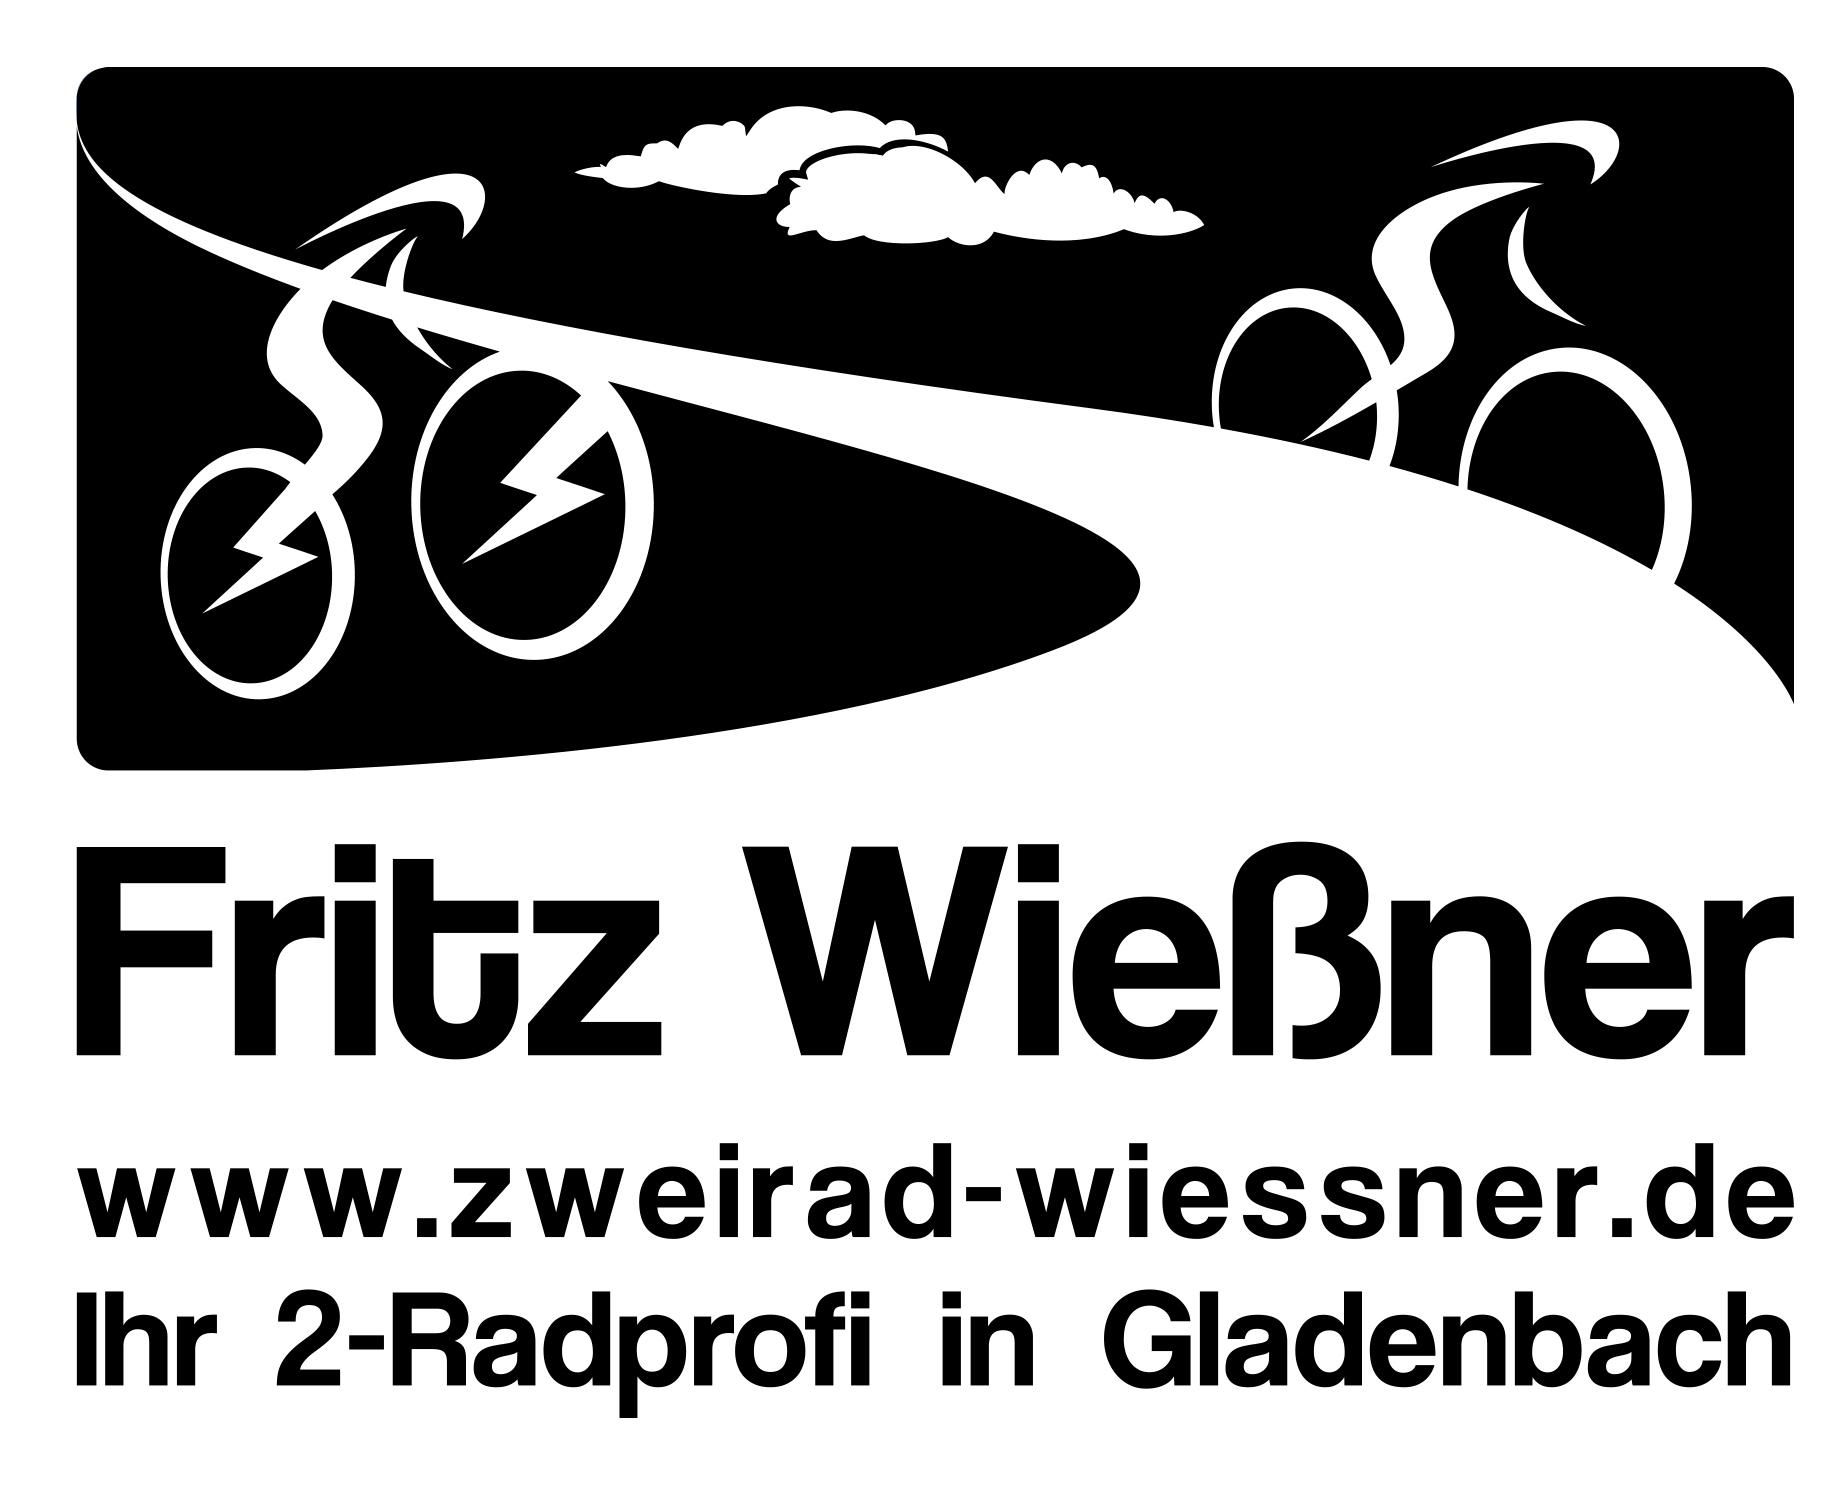 2021-01-27_6011904572532_fritz-wiessner-V2-1c